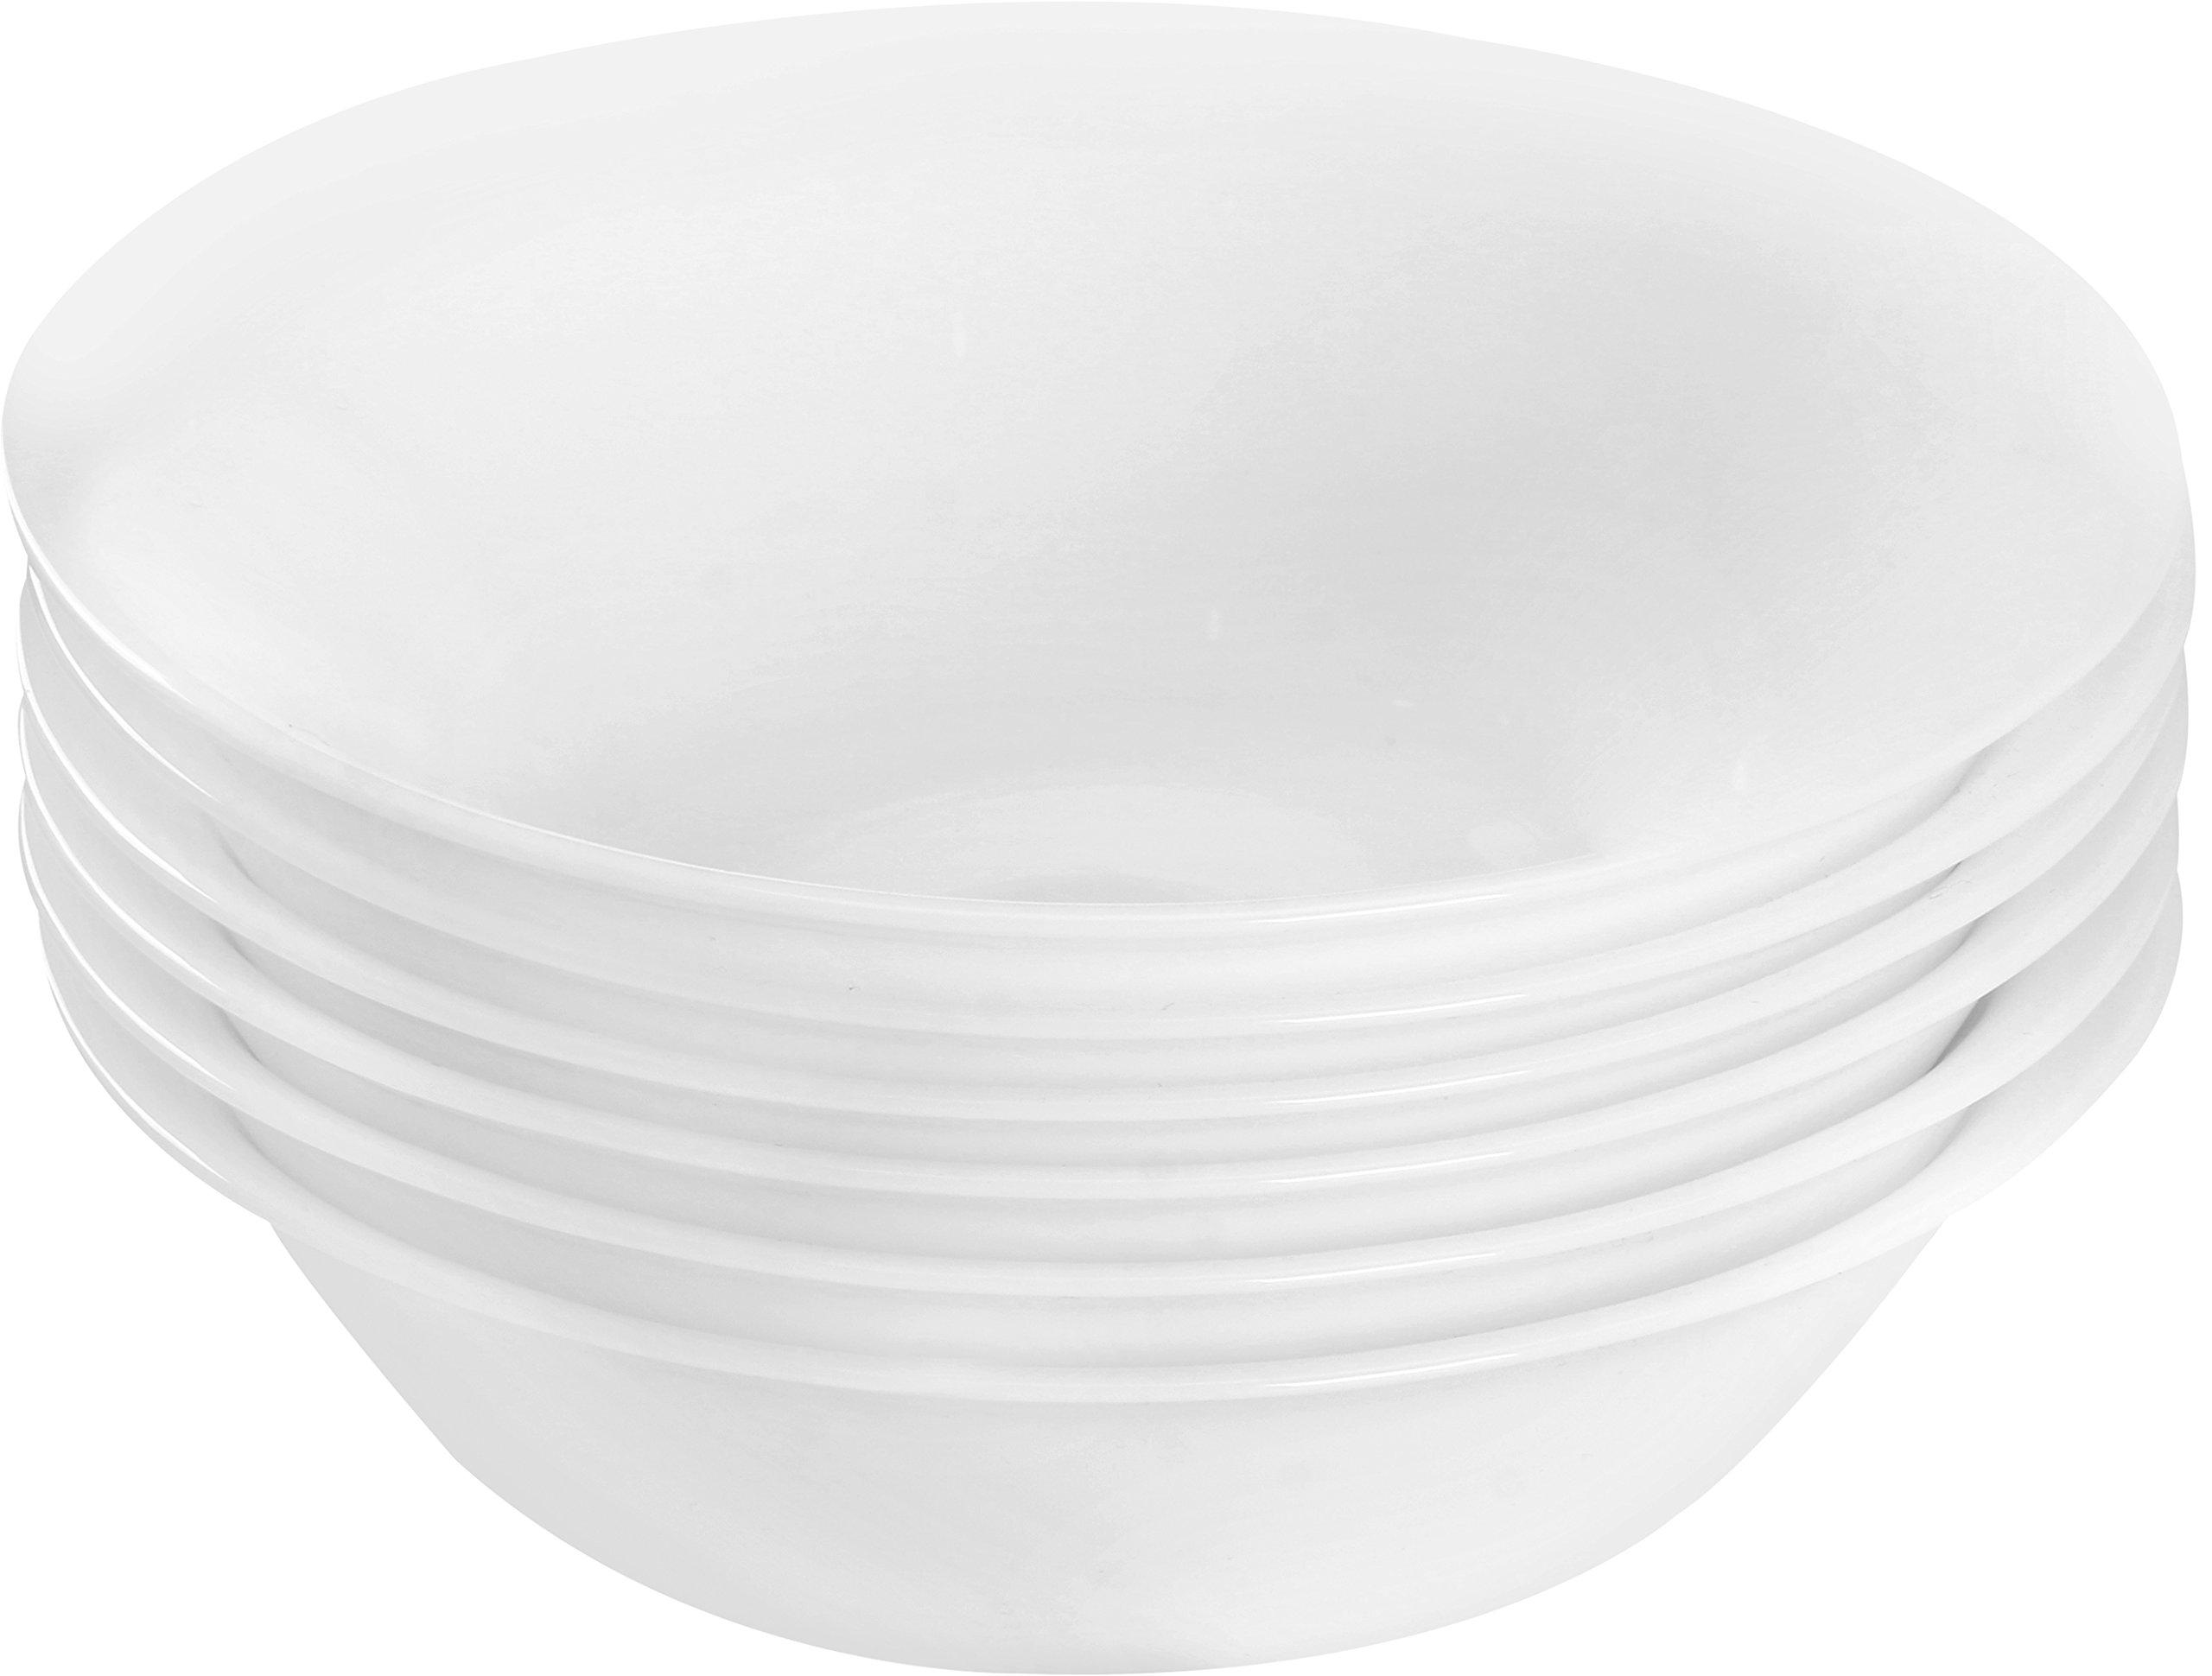 Utopia Kitchen 6 Pieces Bowl Set - Dishwasher Safe Opal Glassware - Microwave/Oven Friendly by Utopia Kitchen (Image #2)